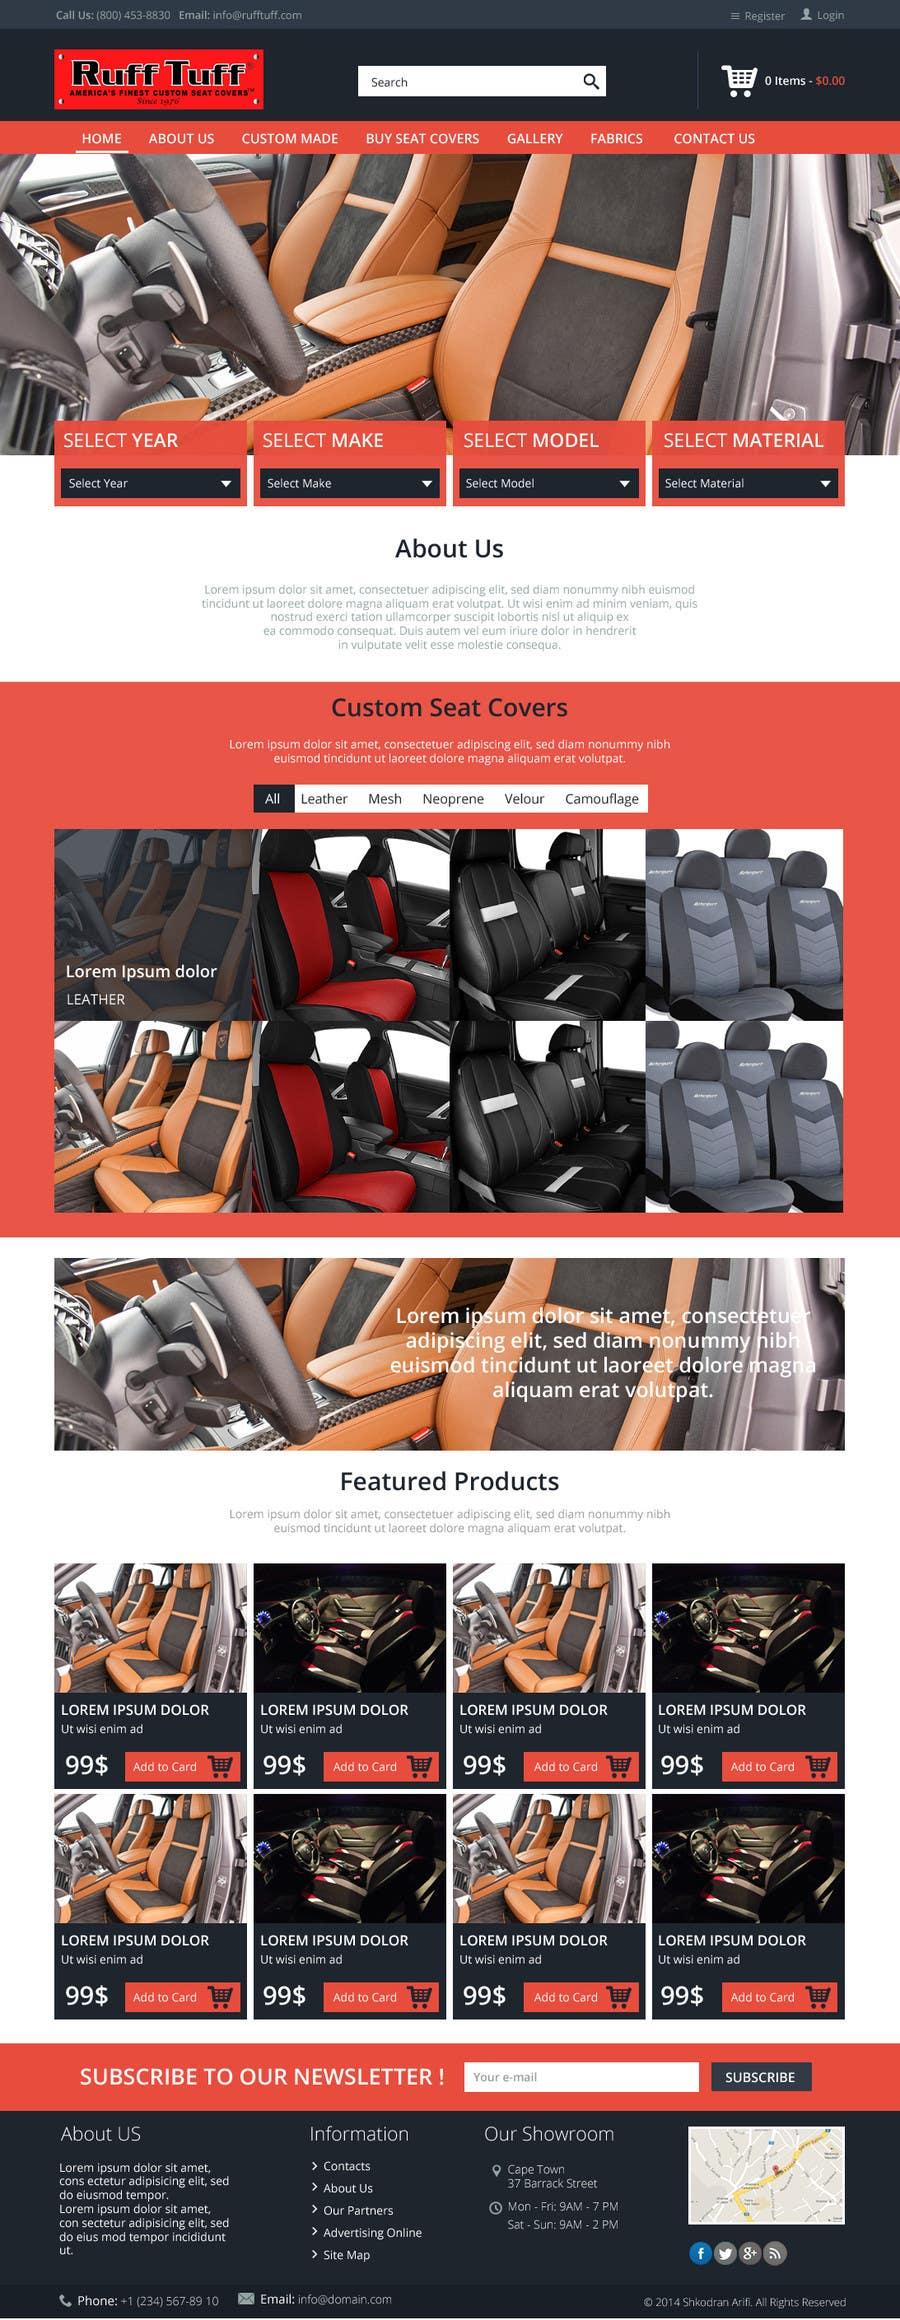 Penyertaan Peraduan #                                        26                                      untuk                                         Design a Website Mockup for an auto seat cover manufacturer